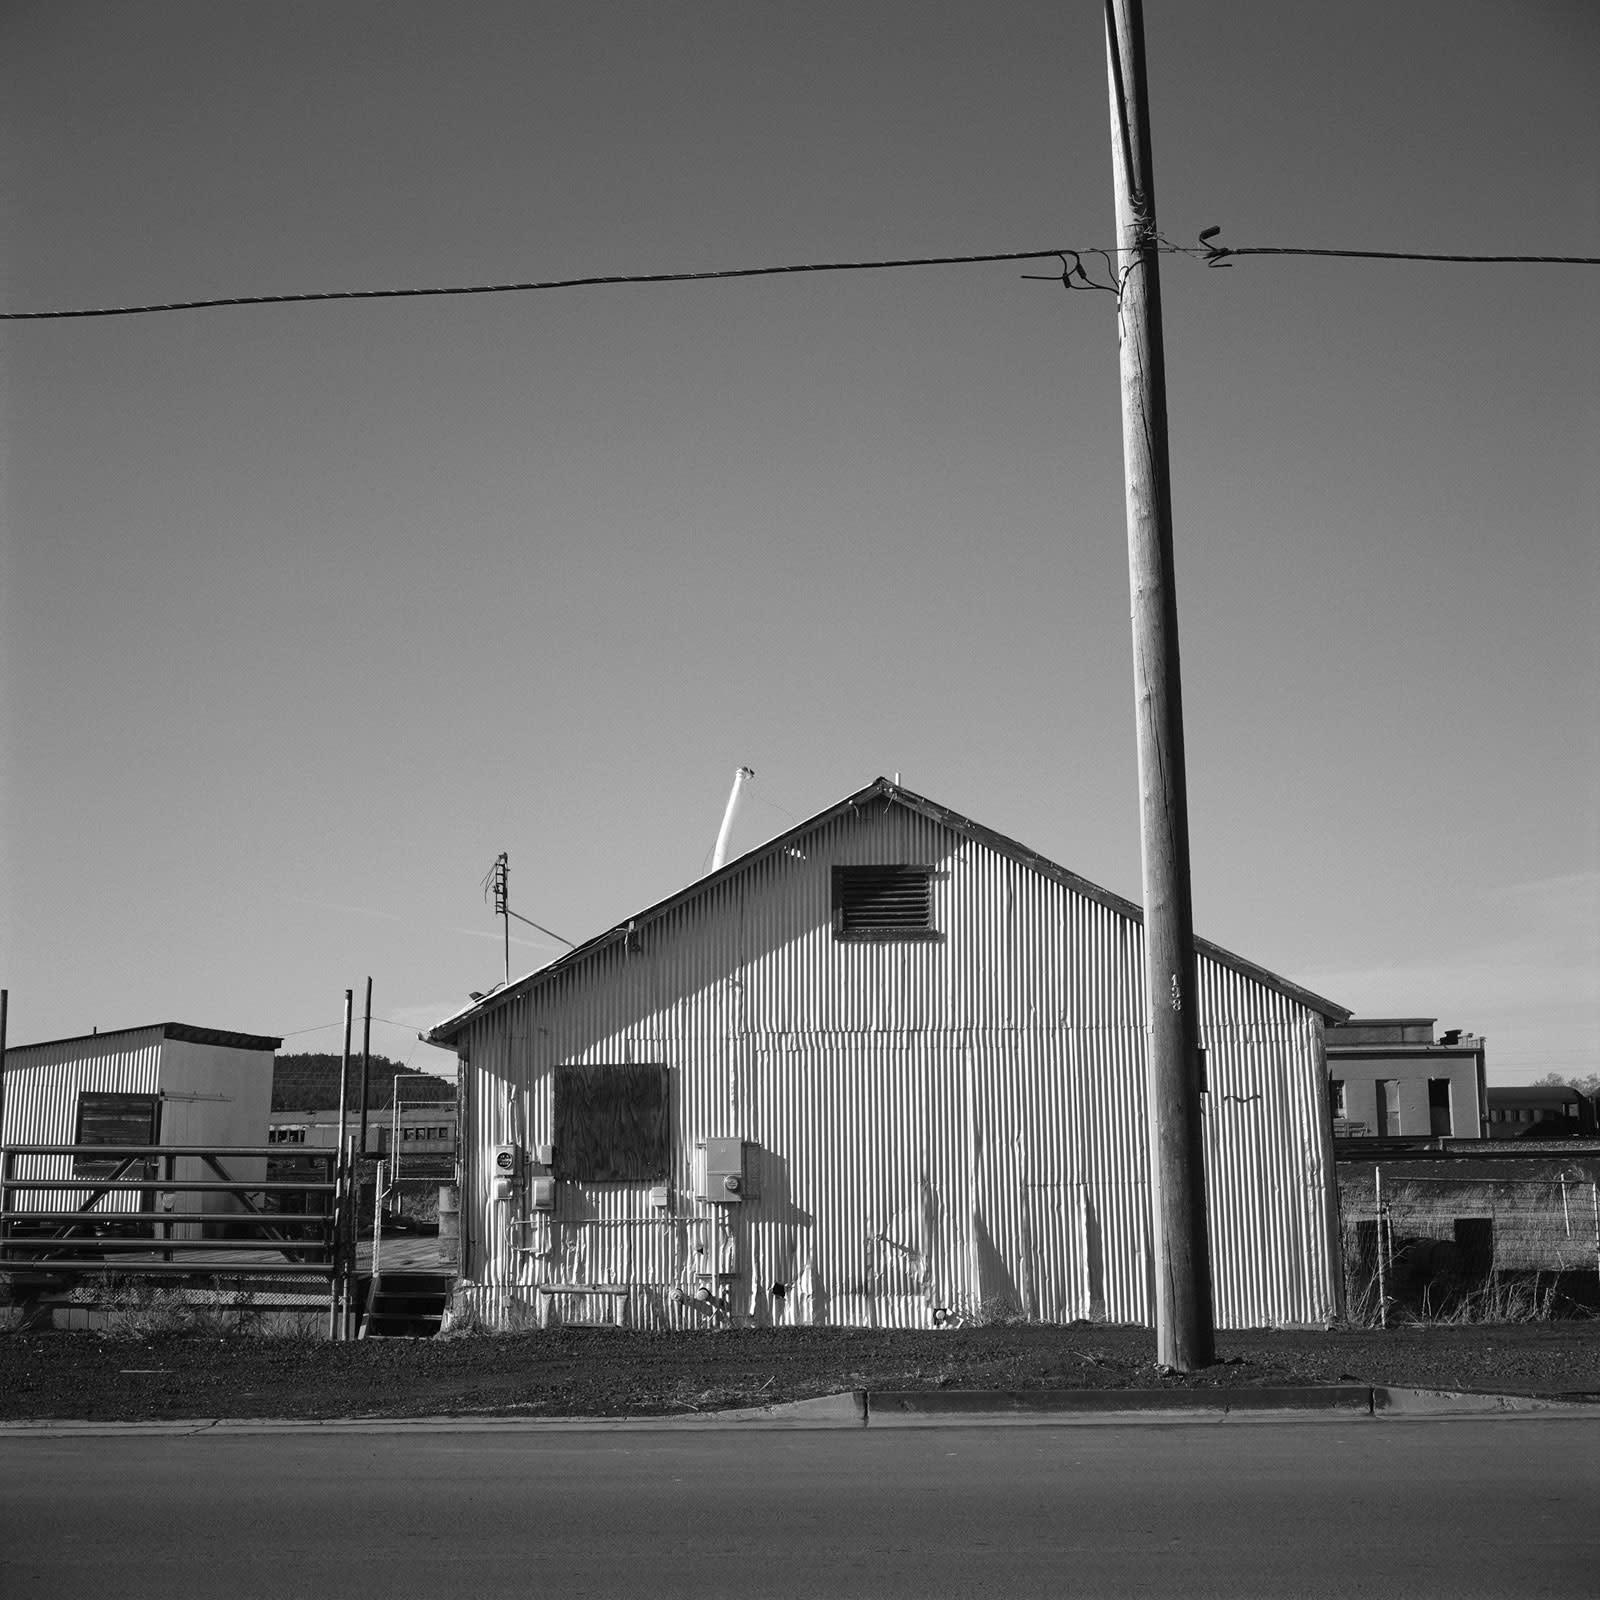 Jean-Christophe Béchet, Williams, Nevada #1, 1999